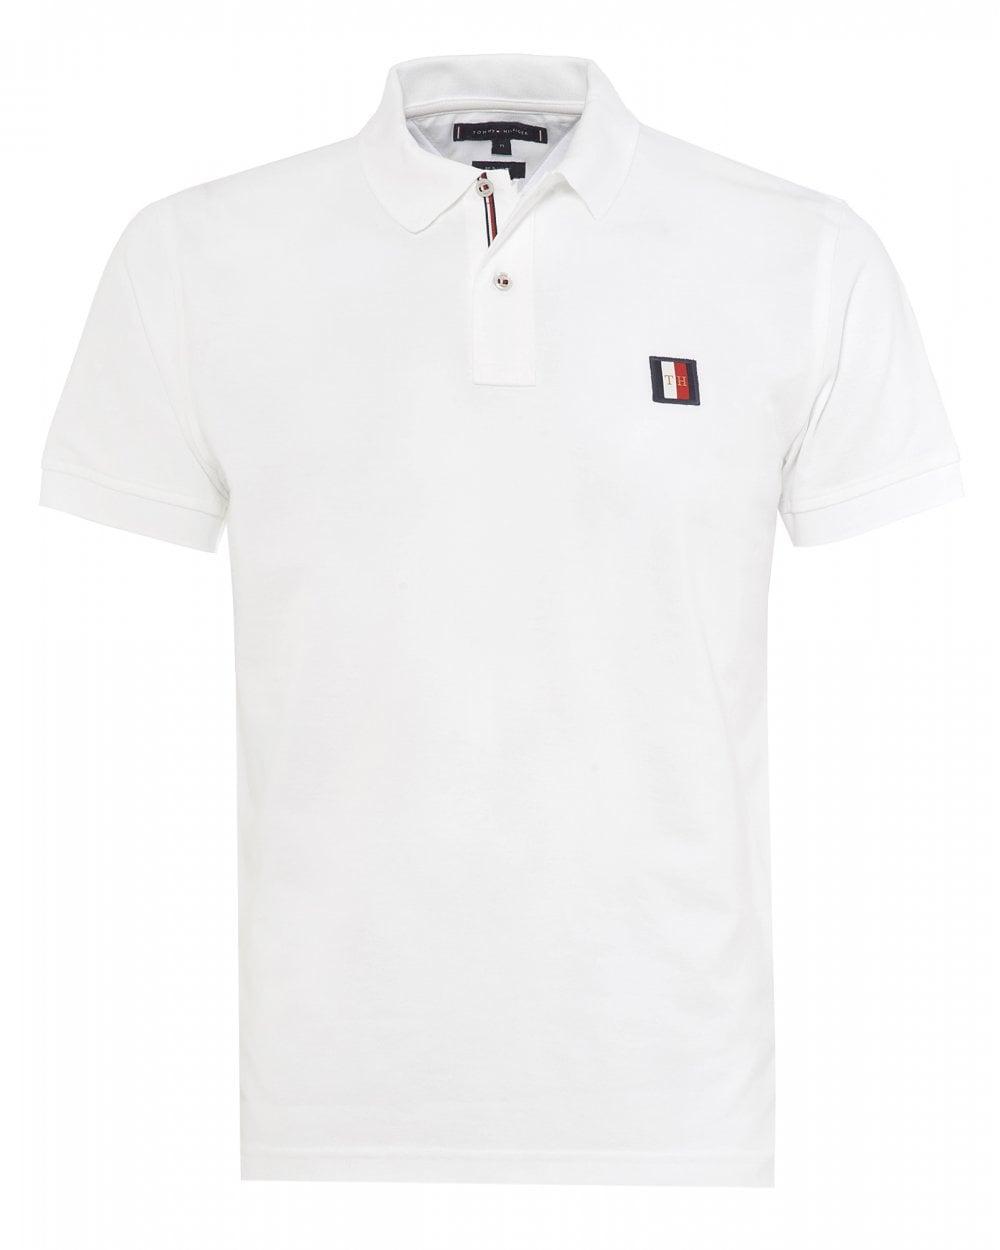 955ce543 Tommy Hilfiger Mens Monogram Badge White Polo Shirt